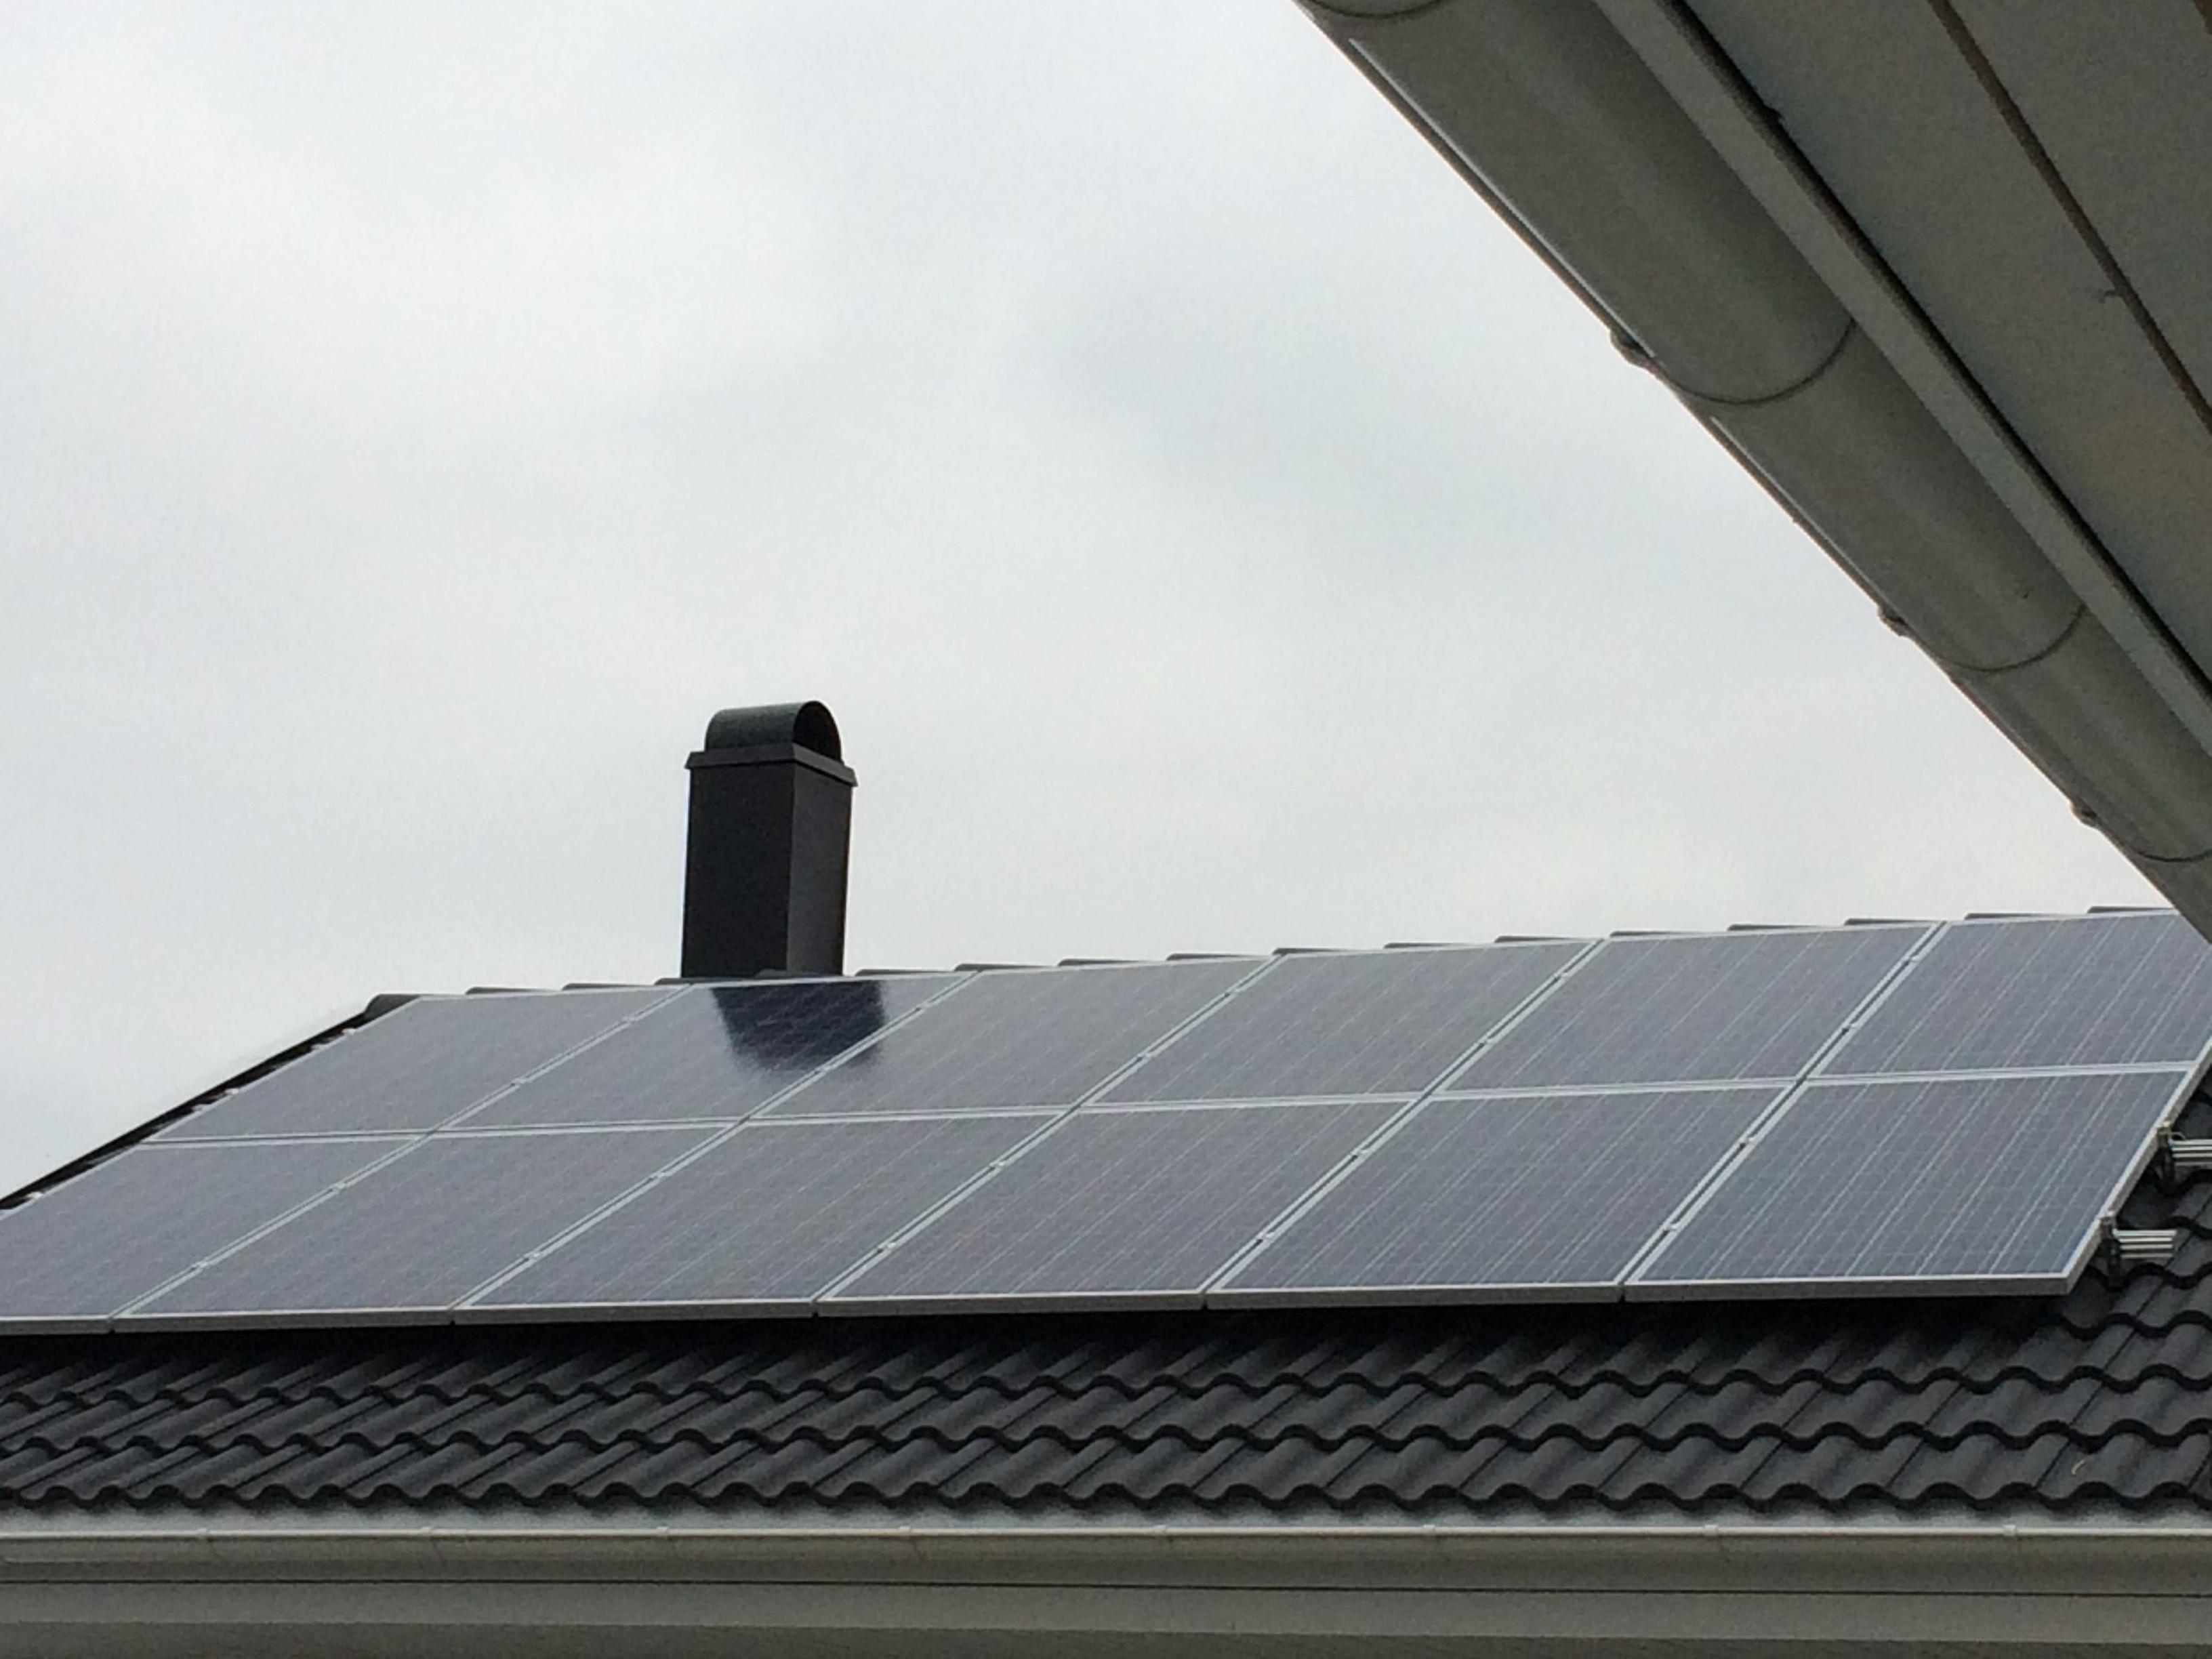 Bostadshus har fatt solpaneler pa taket 3